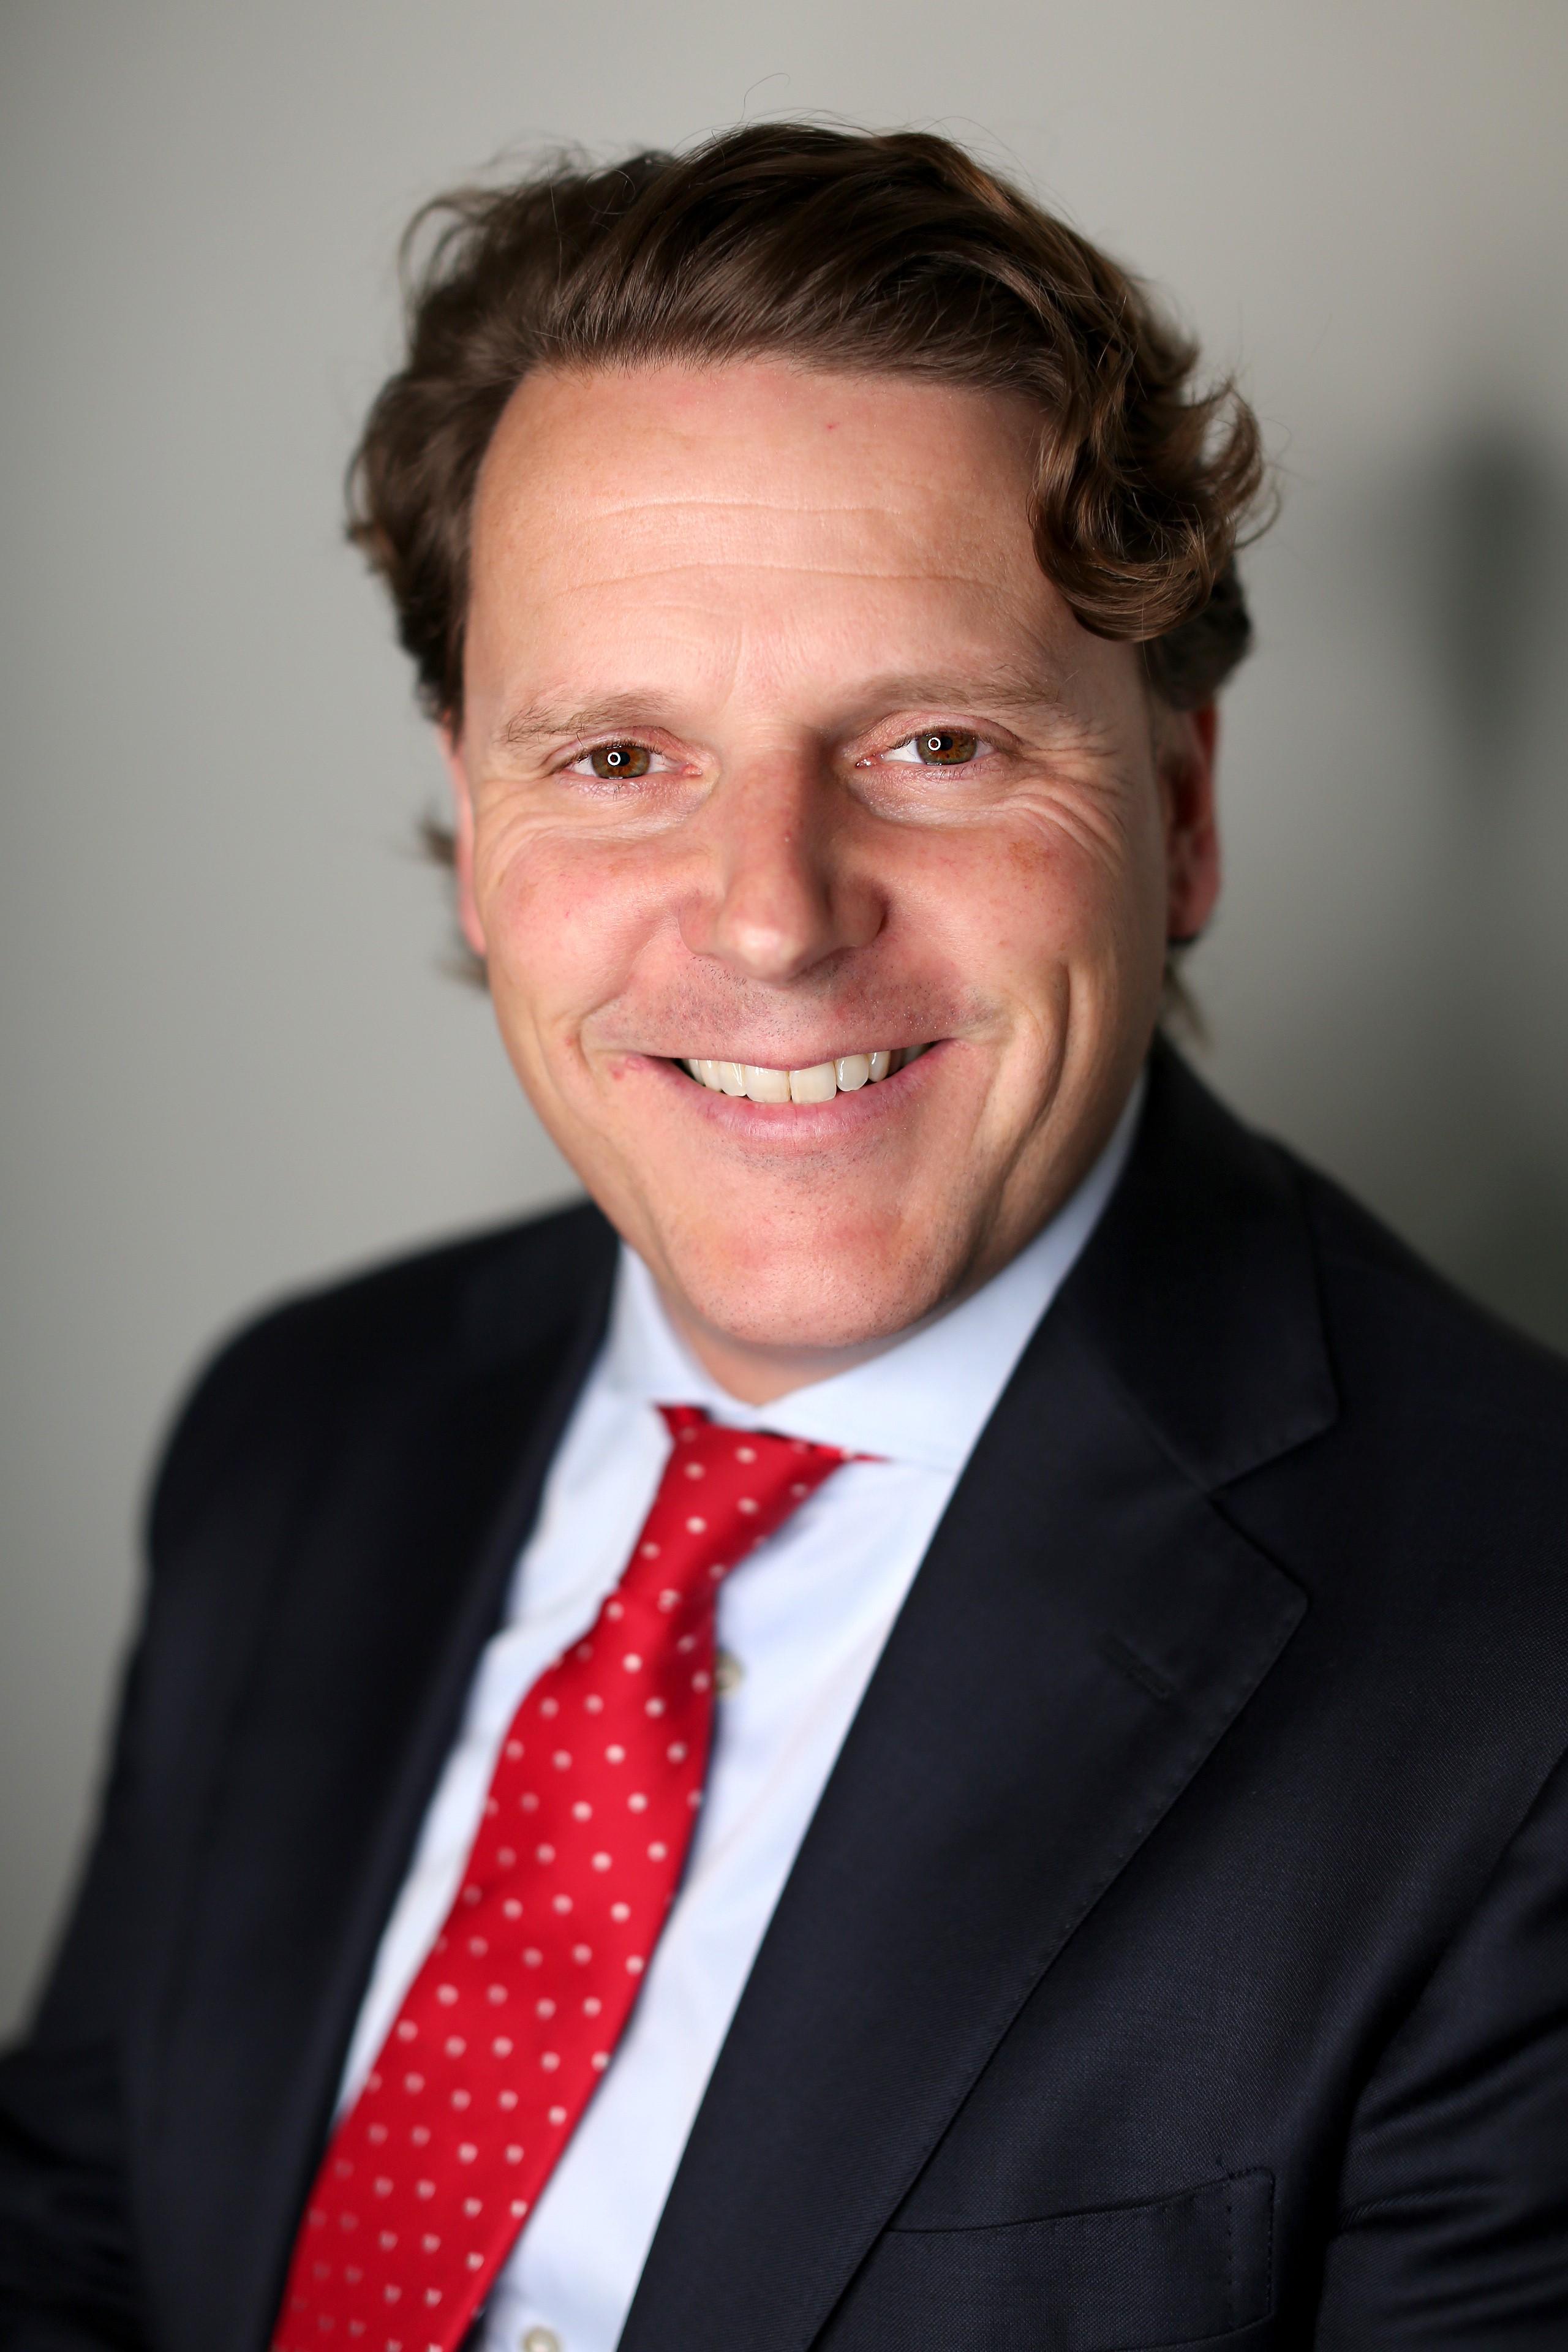 Florian Vreeburg